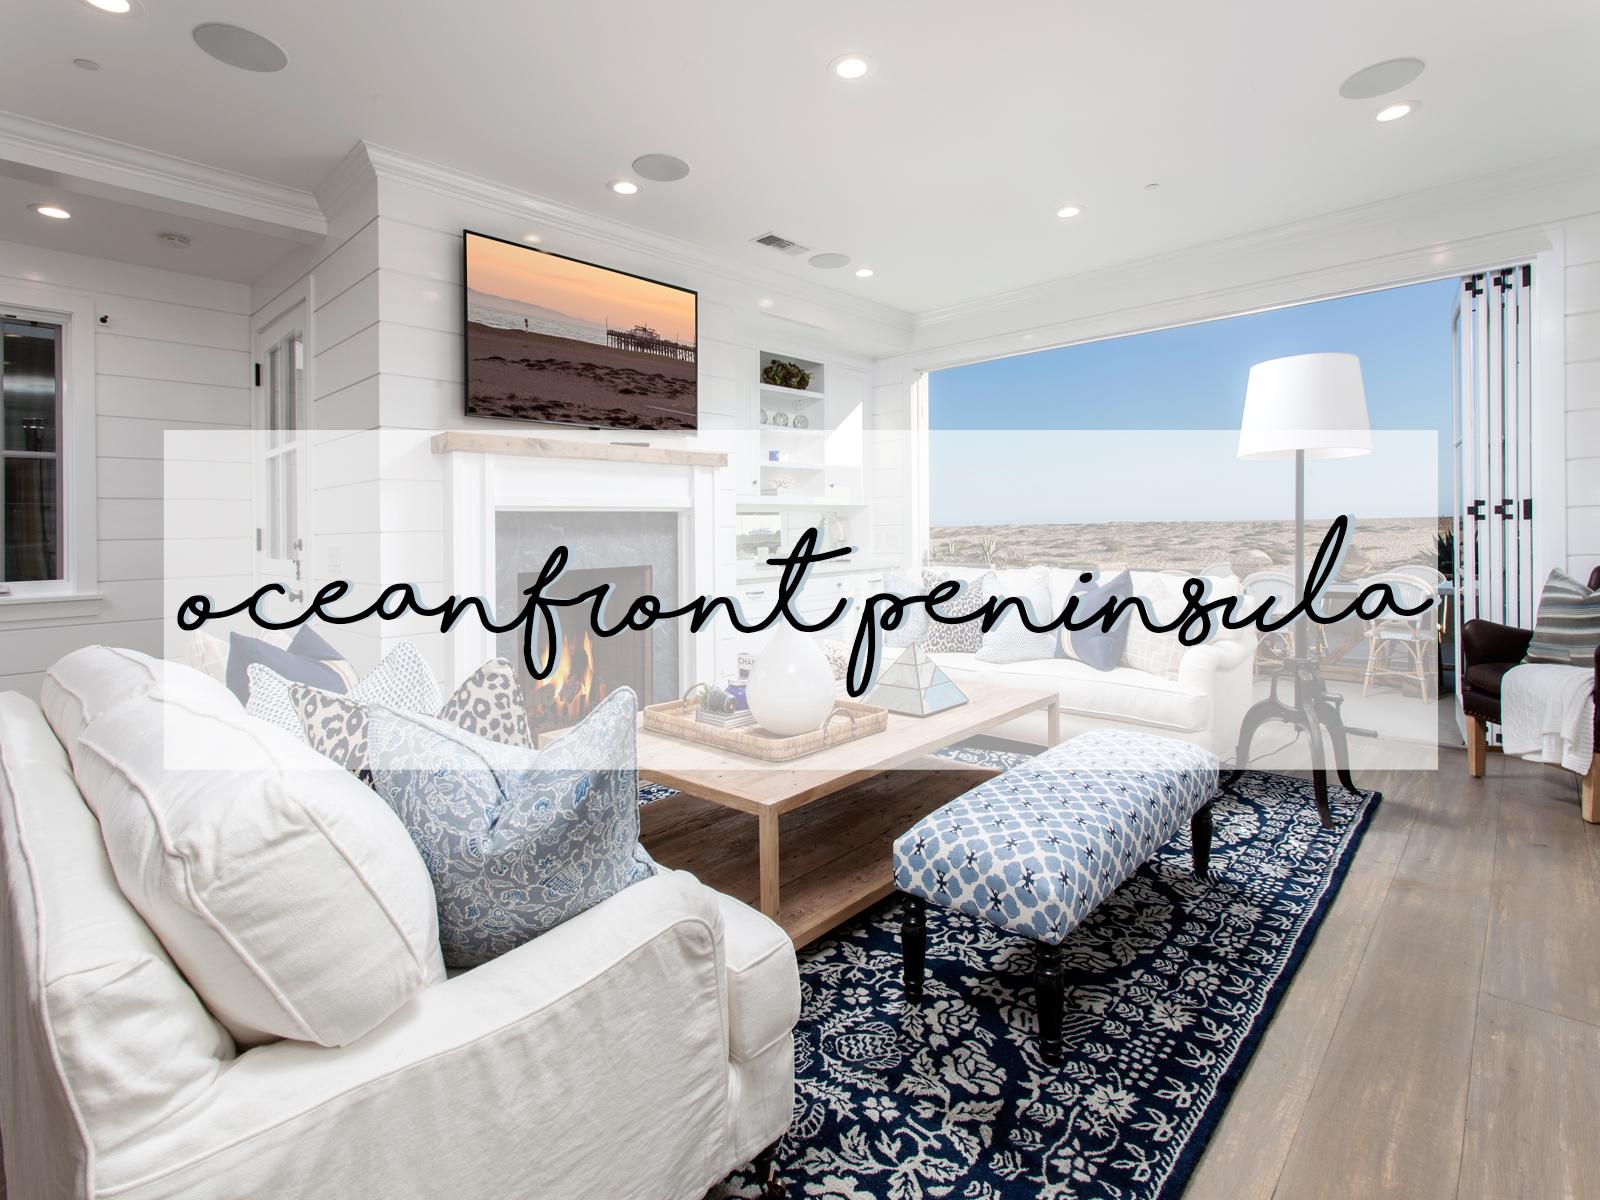 blackband_design_oceanfront-peninsula